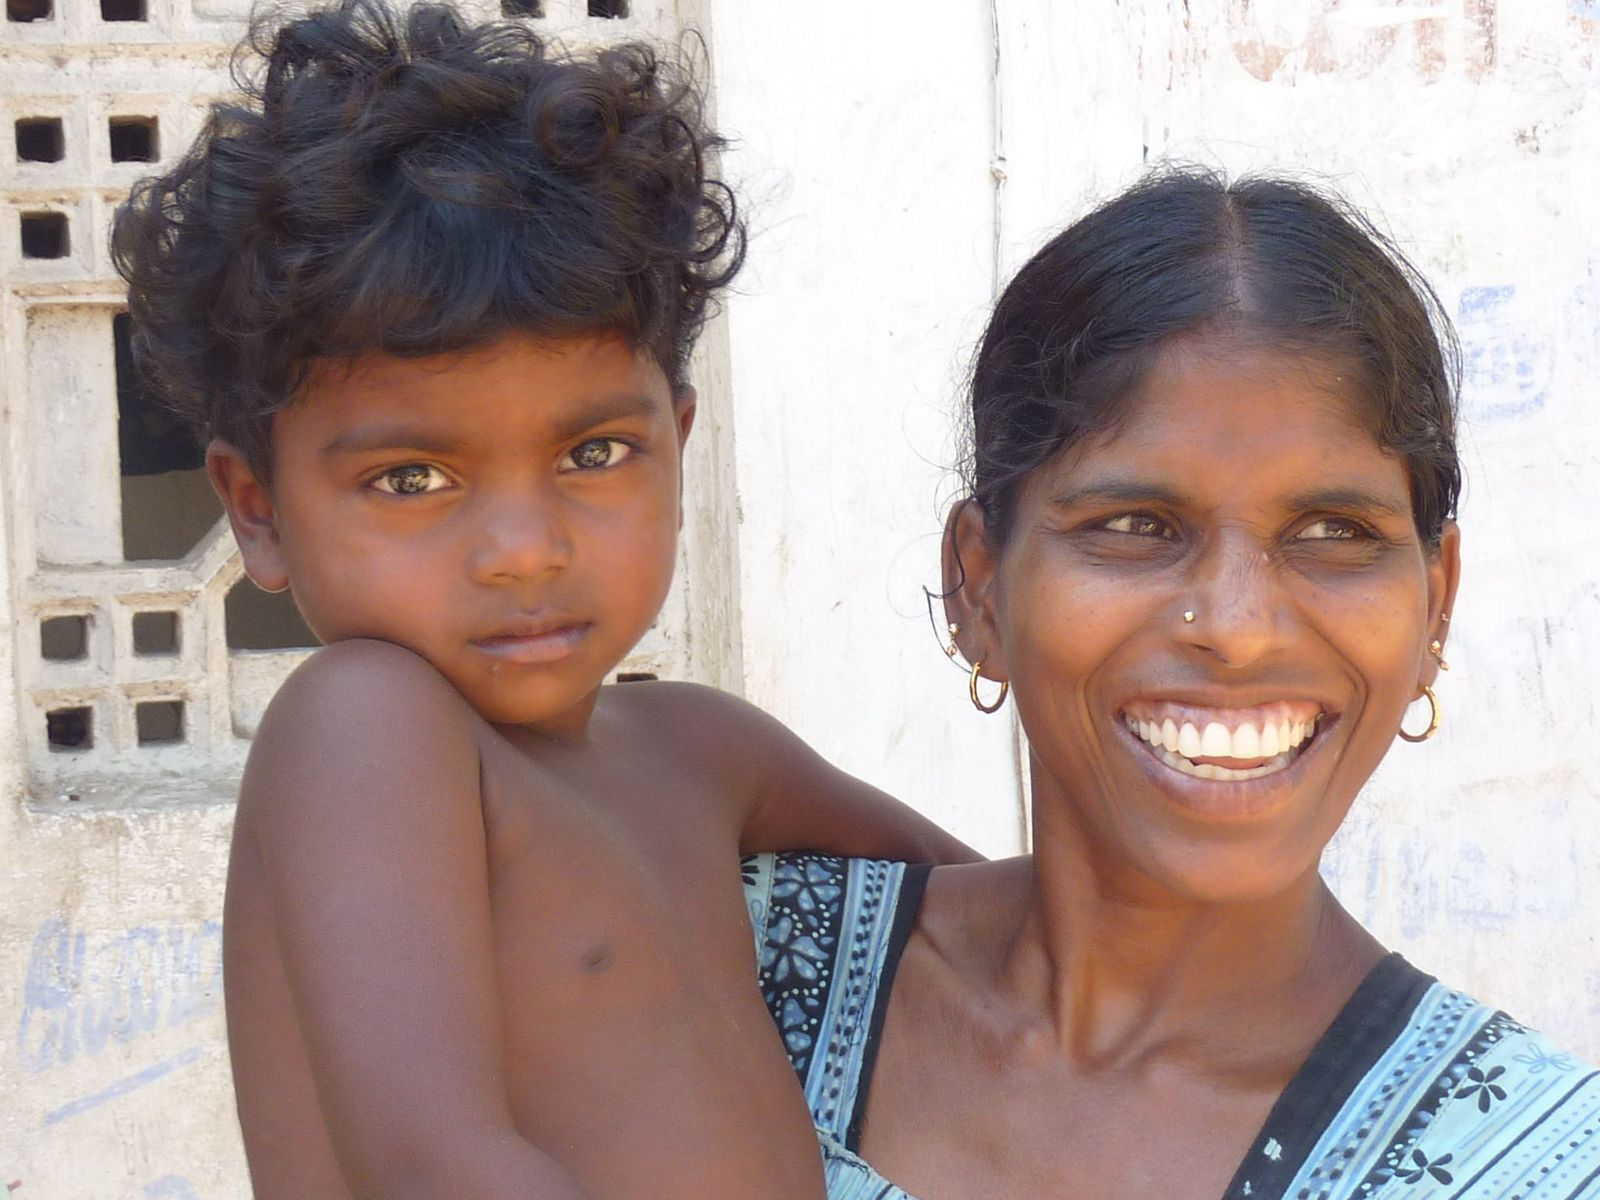 Village de Periyakattupalayam (Tamil Nadu en Inde), mars 2010 © photo eMmA MessanA